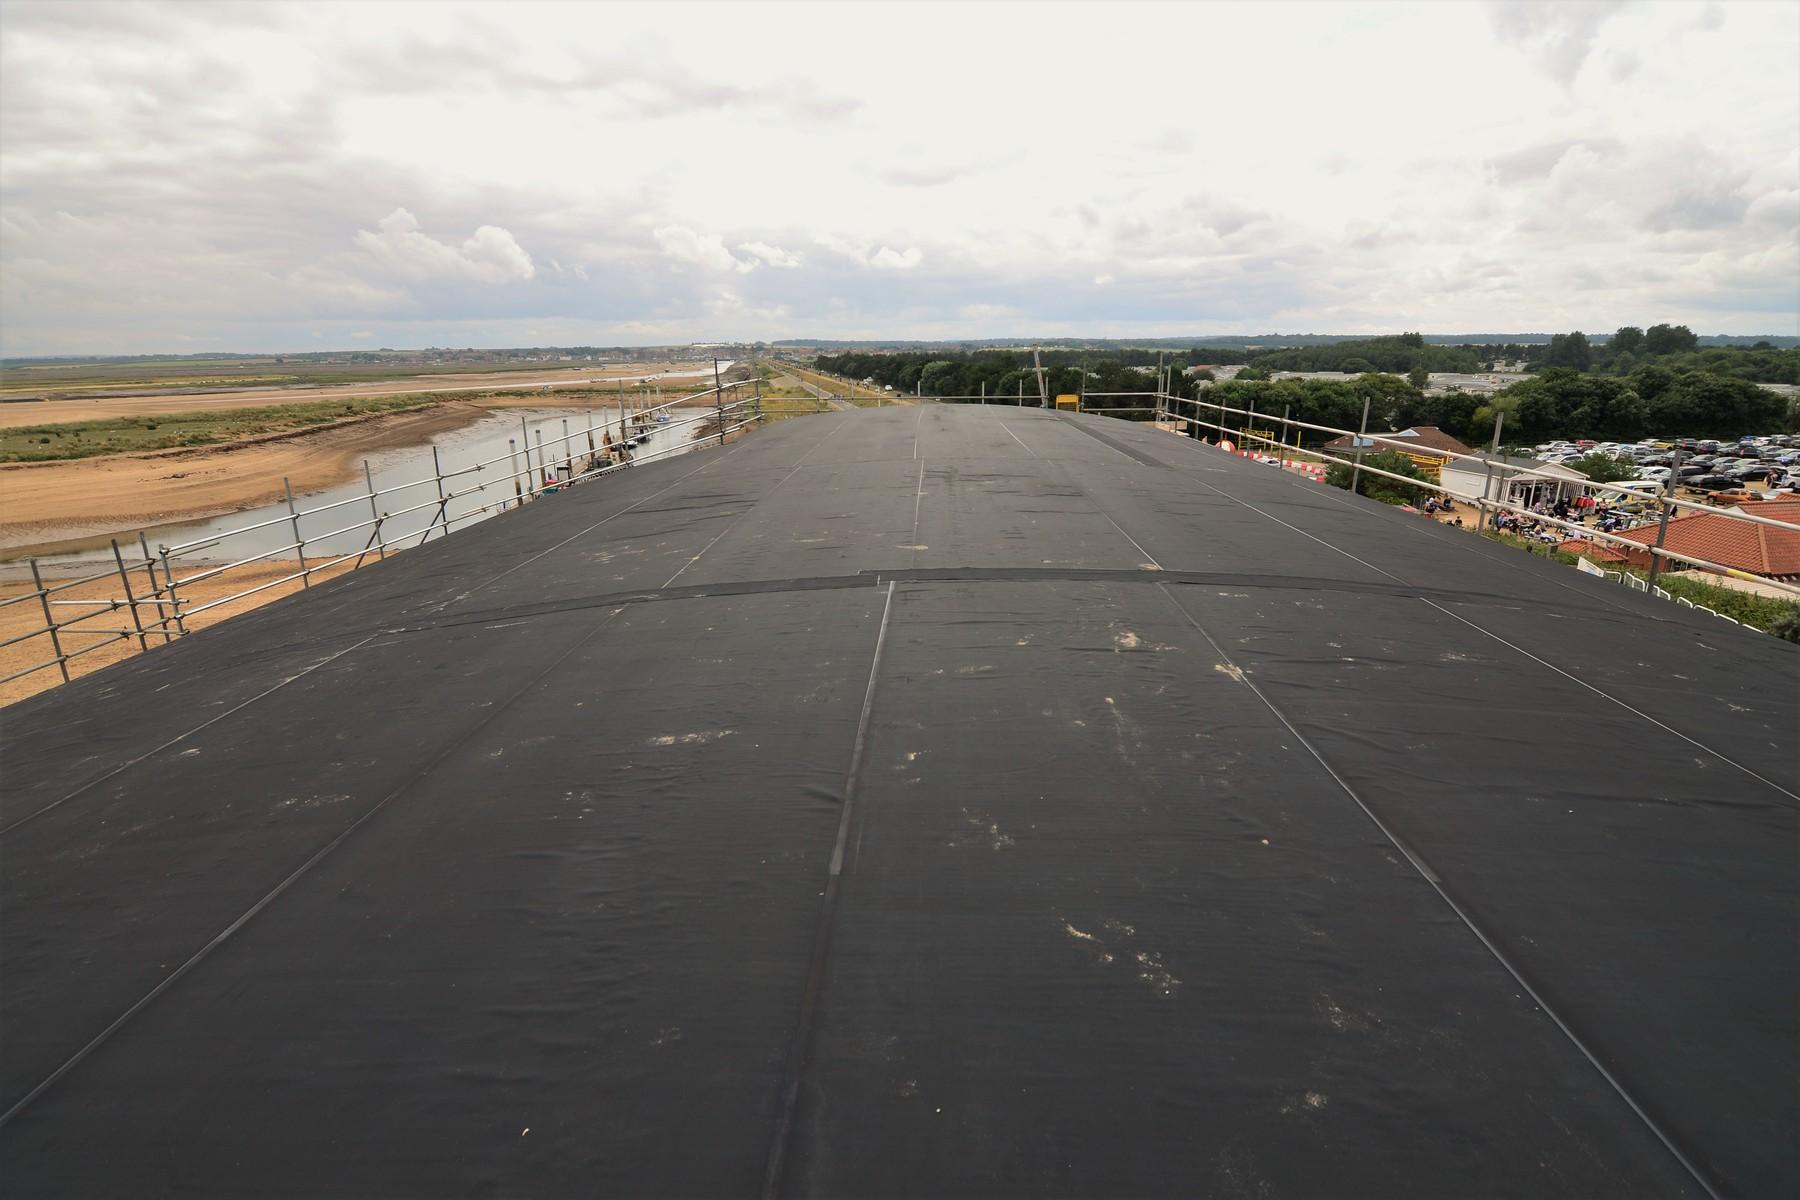 Weatherproof membrane on tjhe main roof